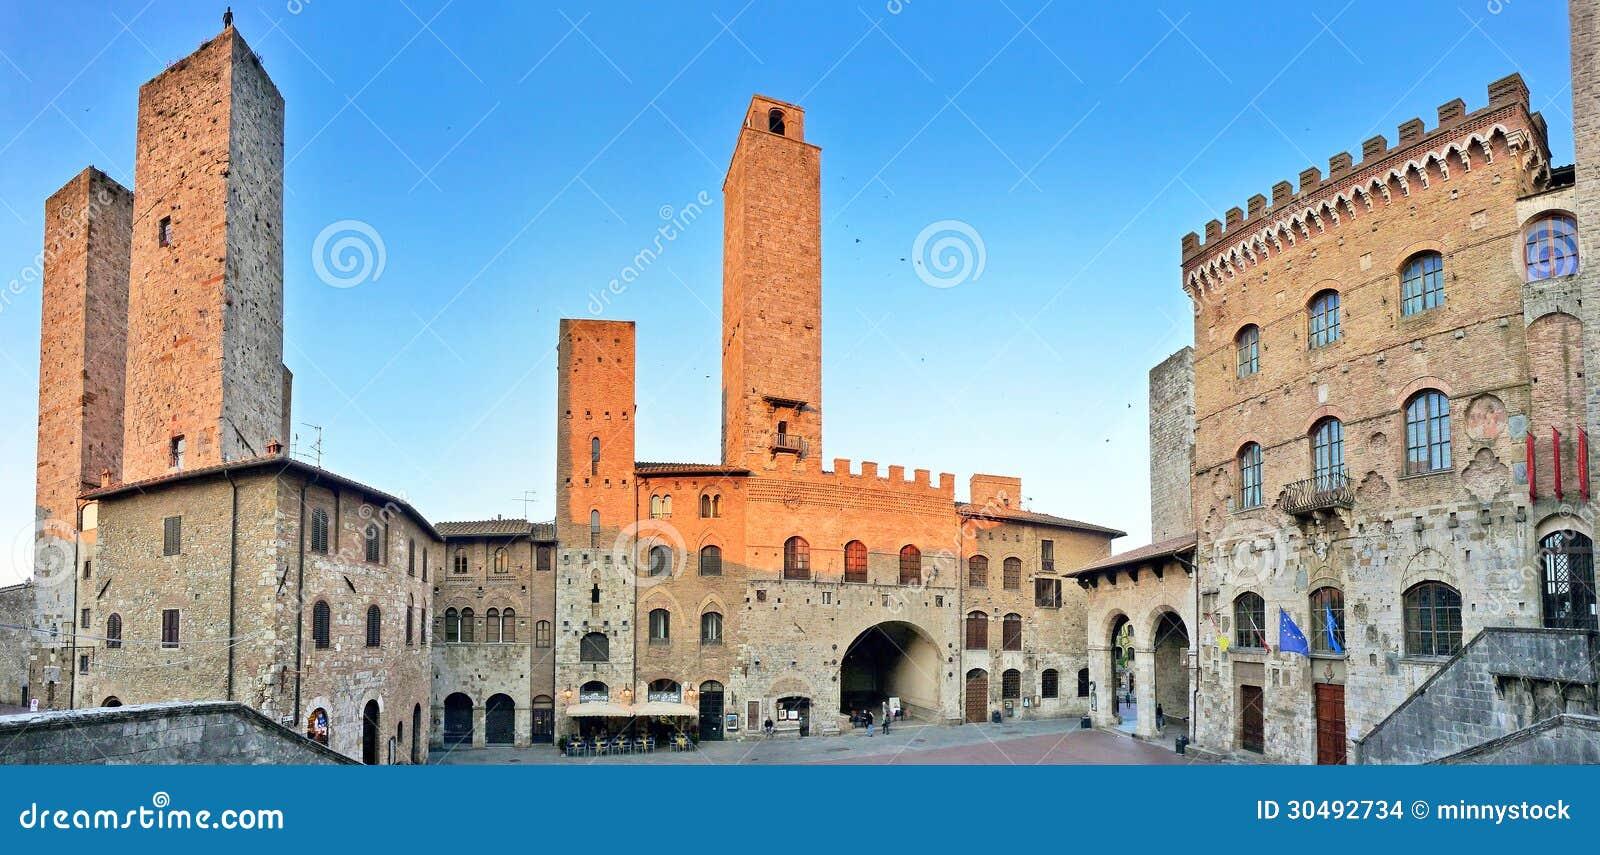 Piazza del Duomo στο SAN Gimignano στο ηλιοβασίλεμα, Τοσκάνη, Ιταλία